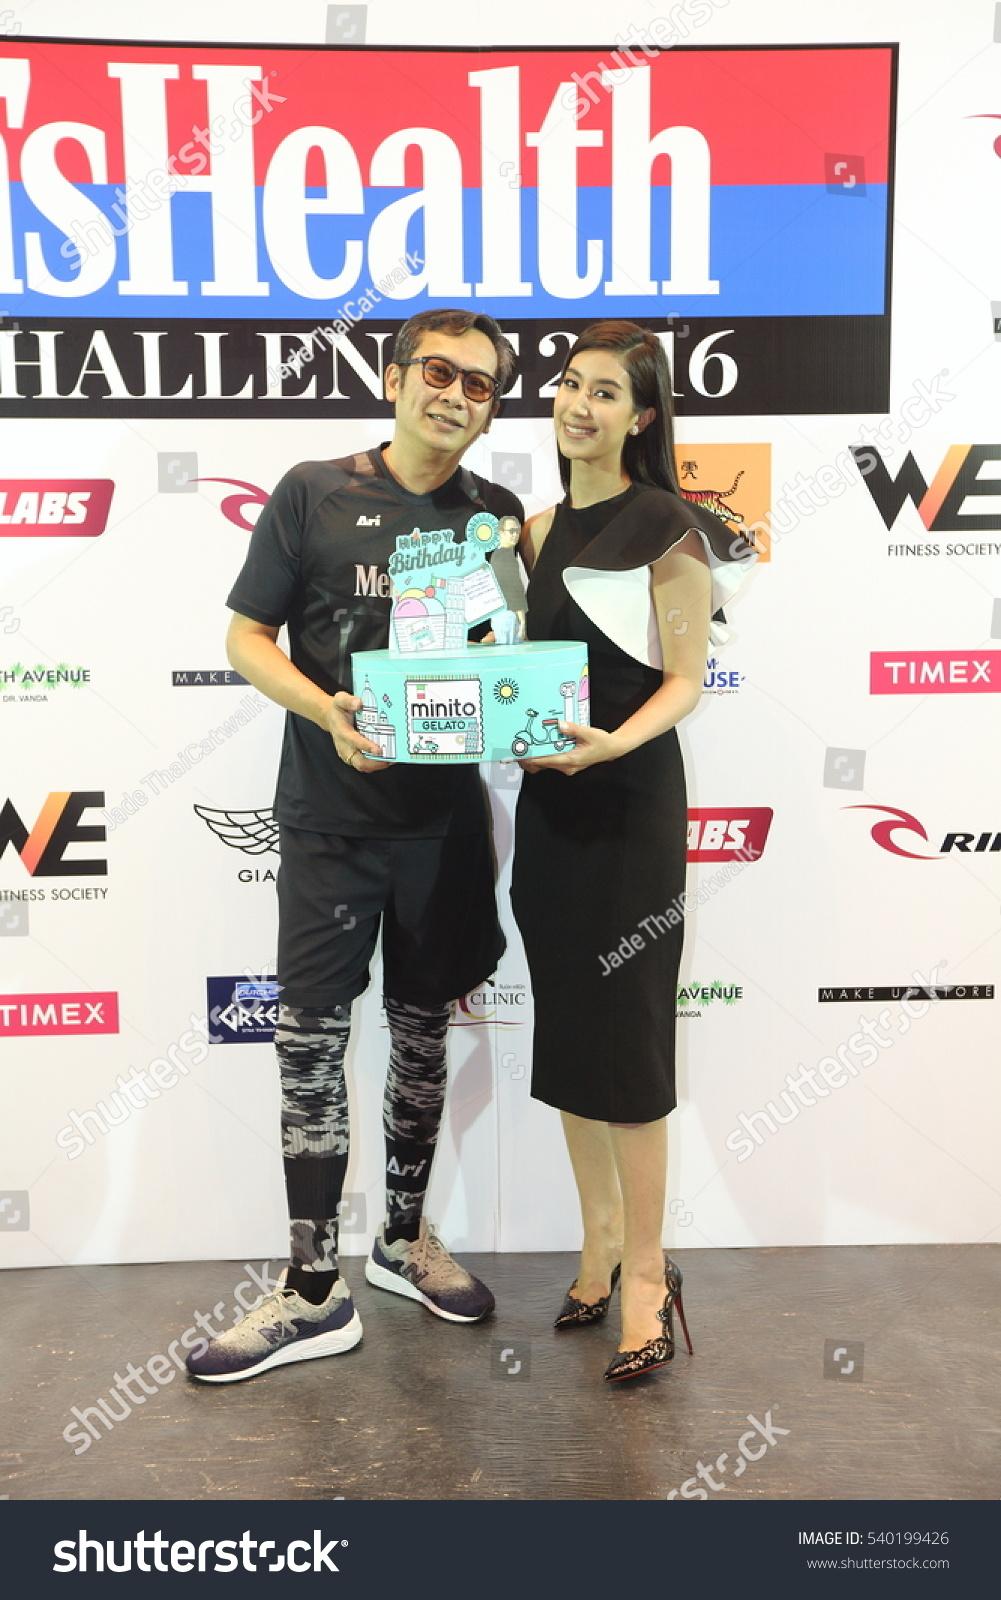 Bangkok Thailand - December 20, 2016 ; Final Round Fashion Show of